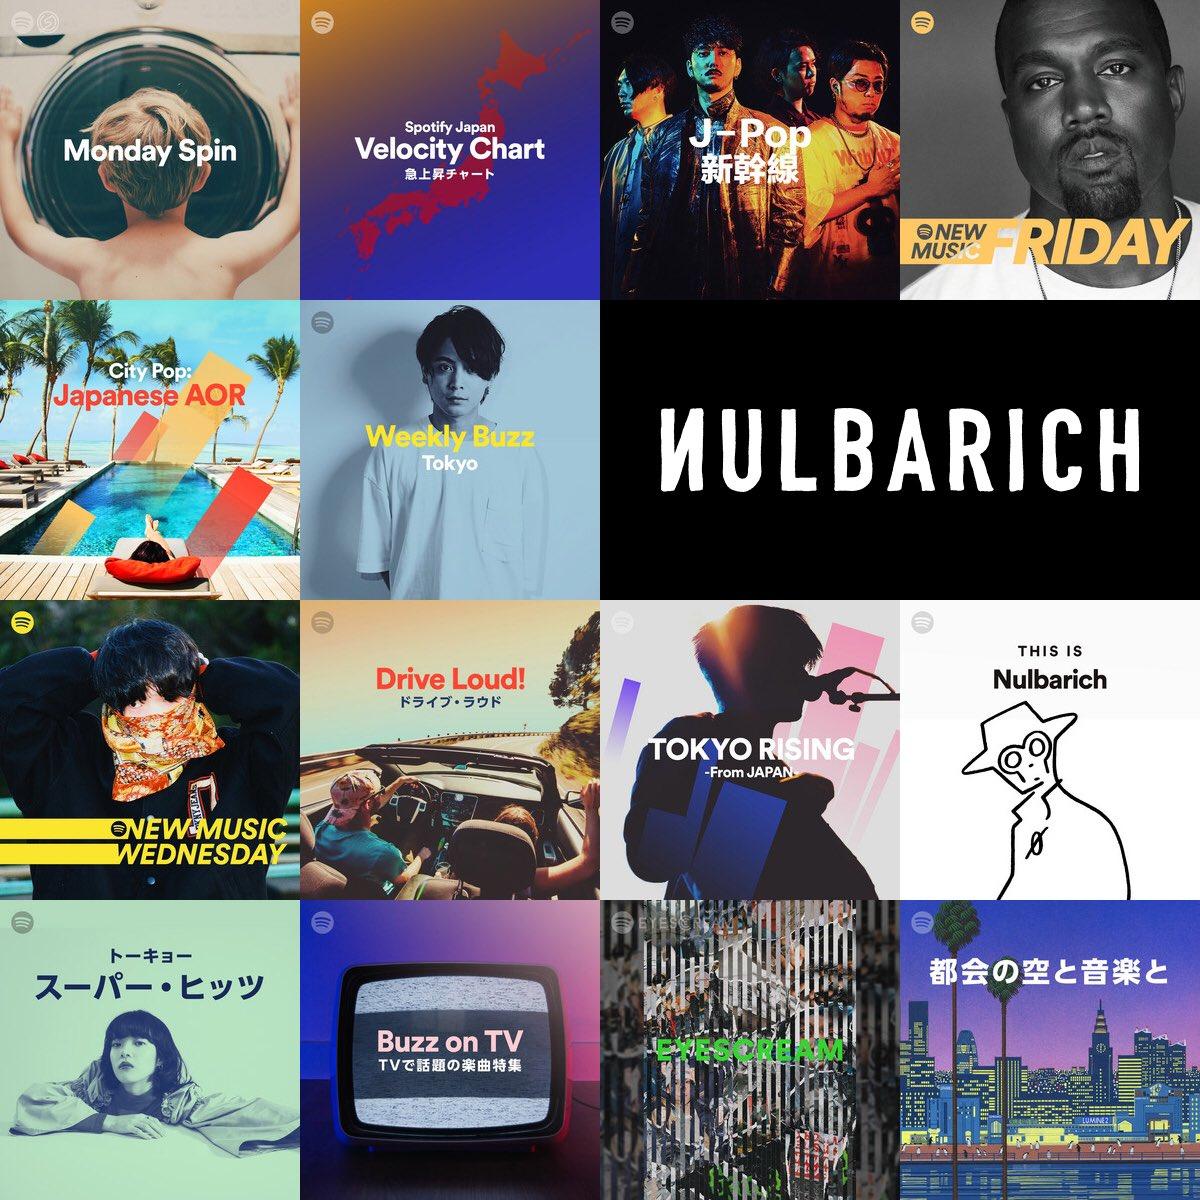 🎧Spotify🎧⚡️各種プレイリストにNulbarichの新曲「LUCK」がPICK UP🙌🙌🙌ぜひ聴いてみてください。🔻まずは「This Is Nulbarich」から👉#Nulbarich #luck @spotifyjp